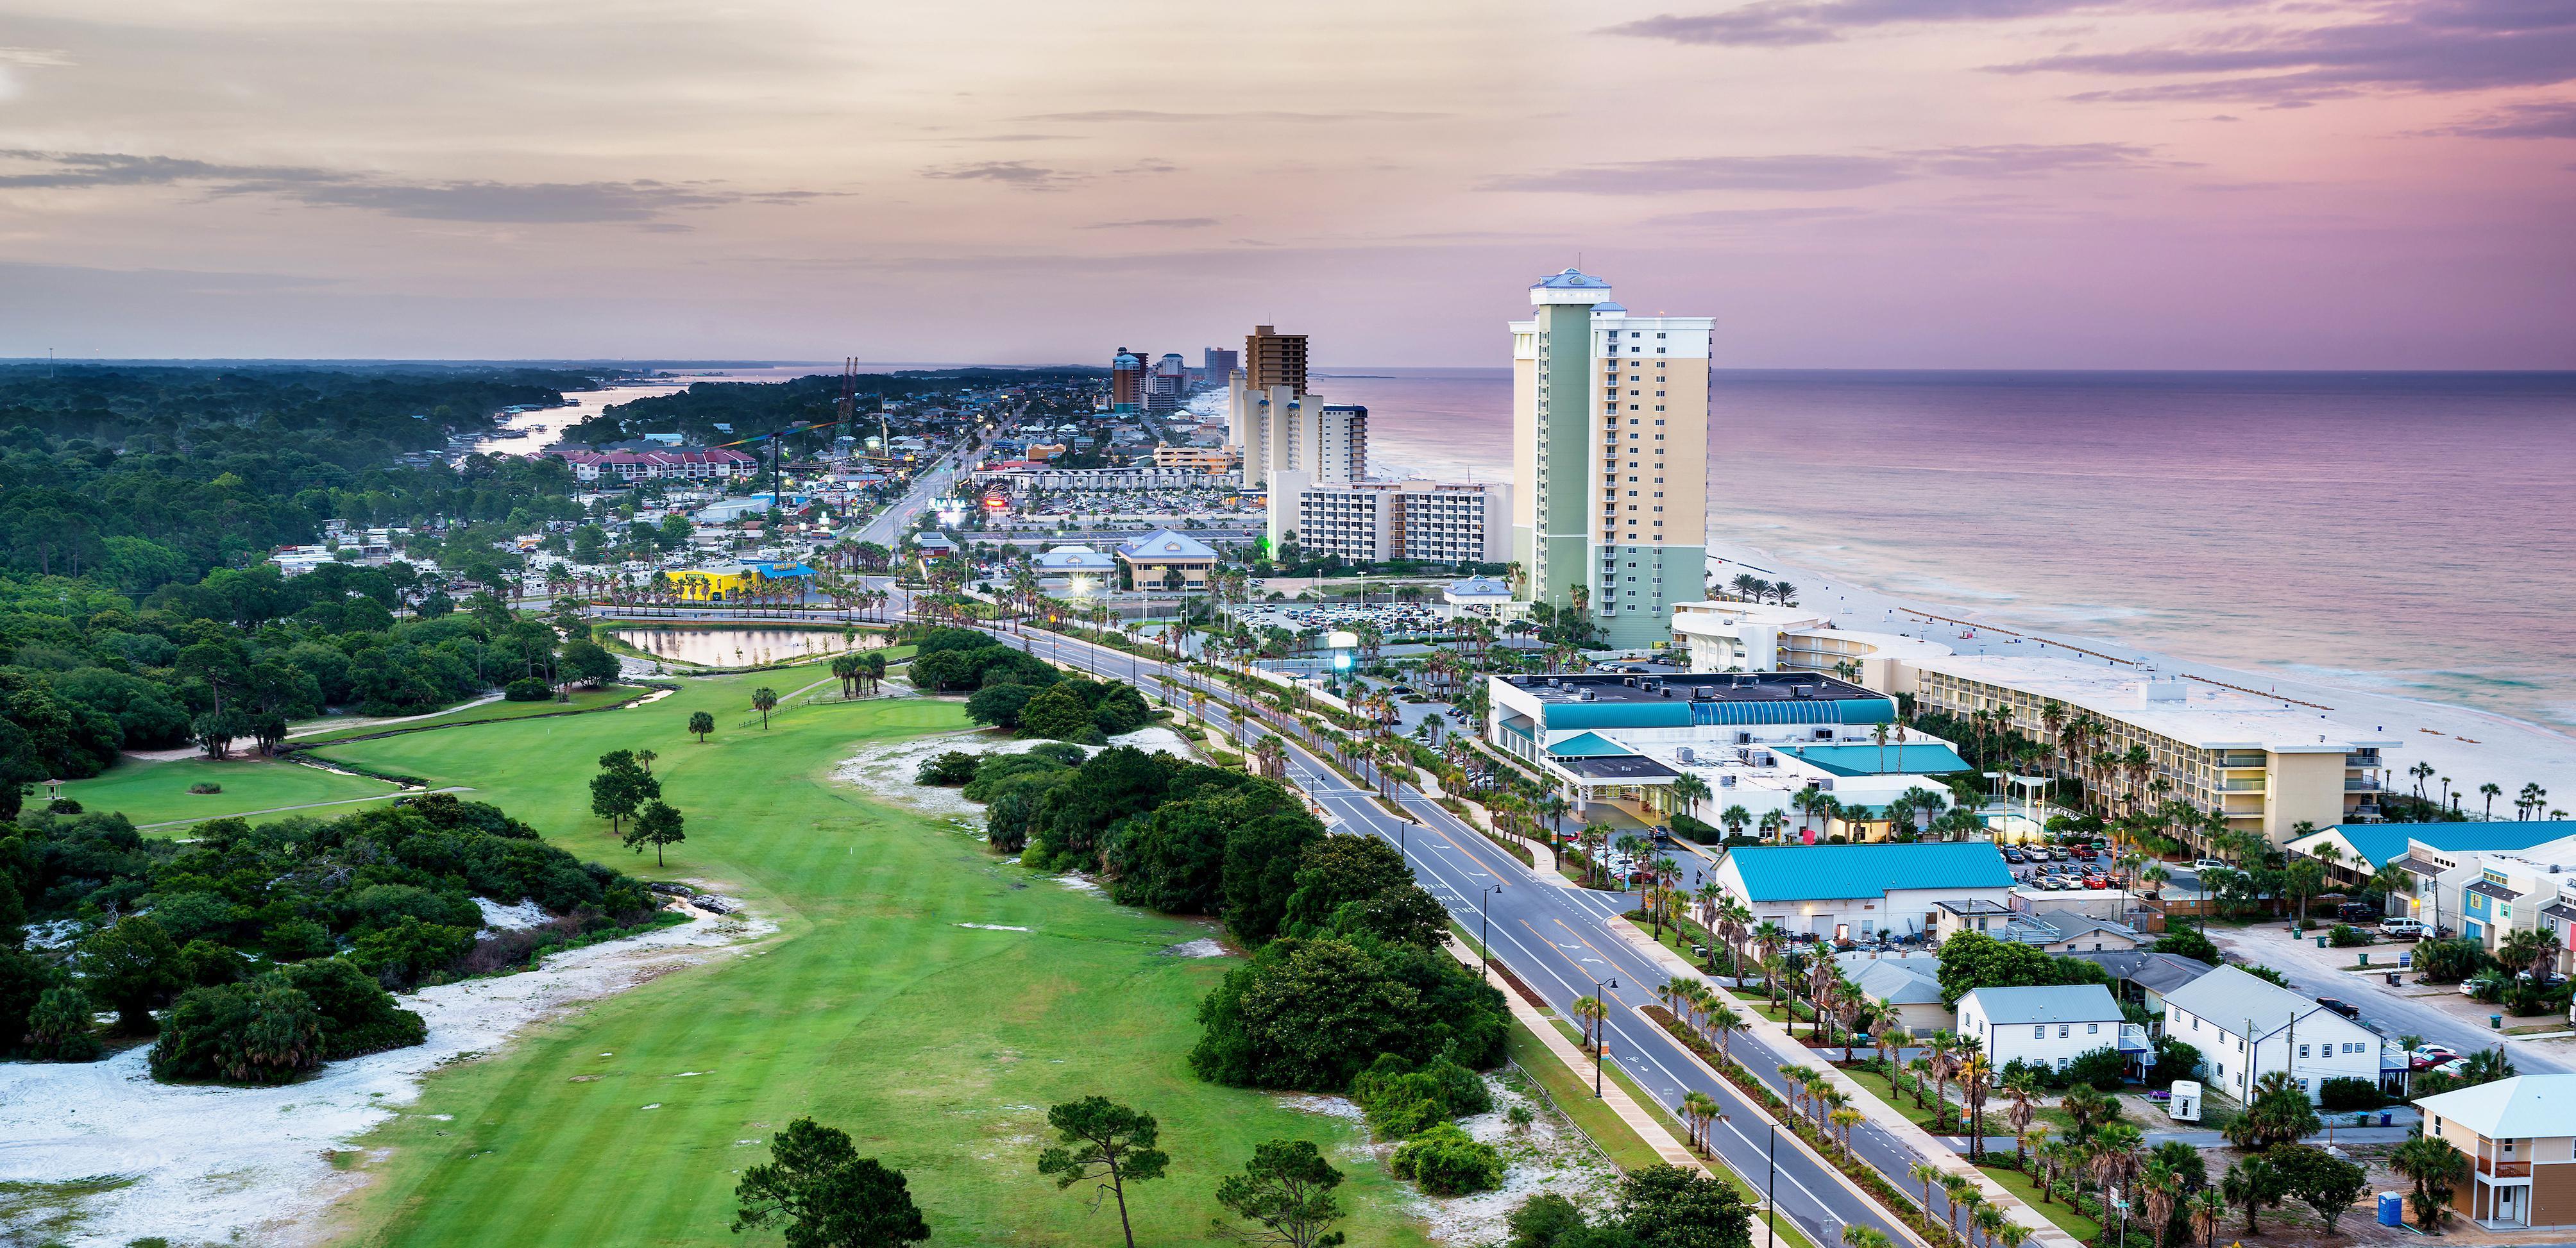 Panoramic view of Panama City, Florida and the beach.